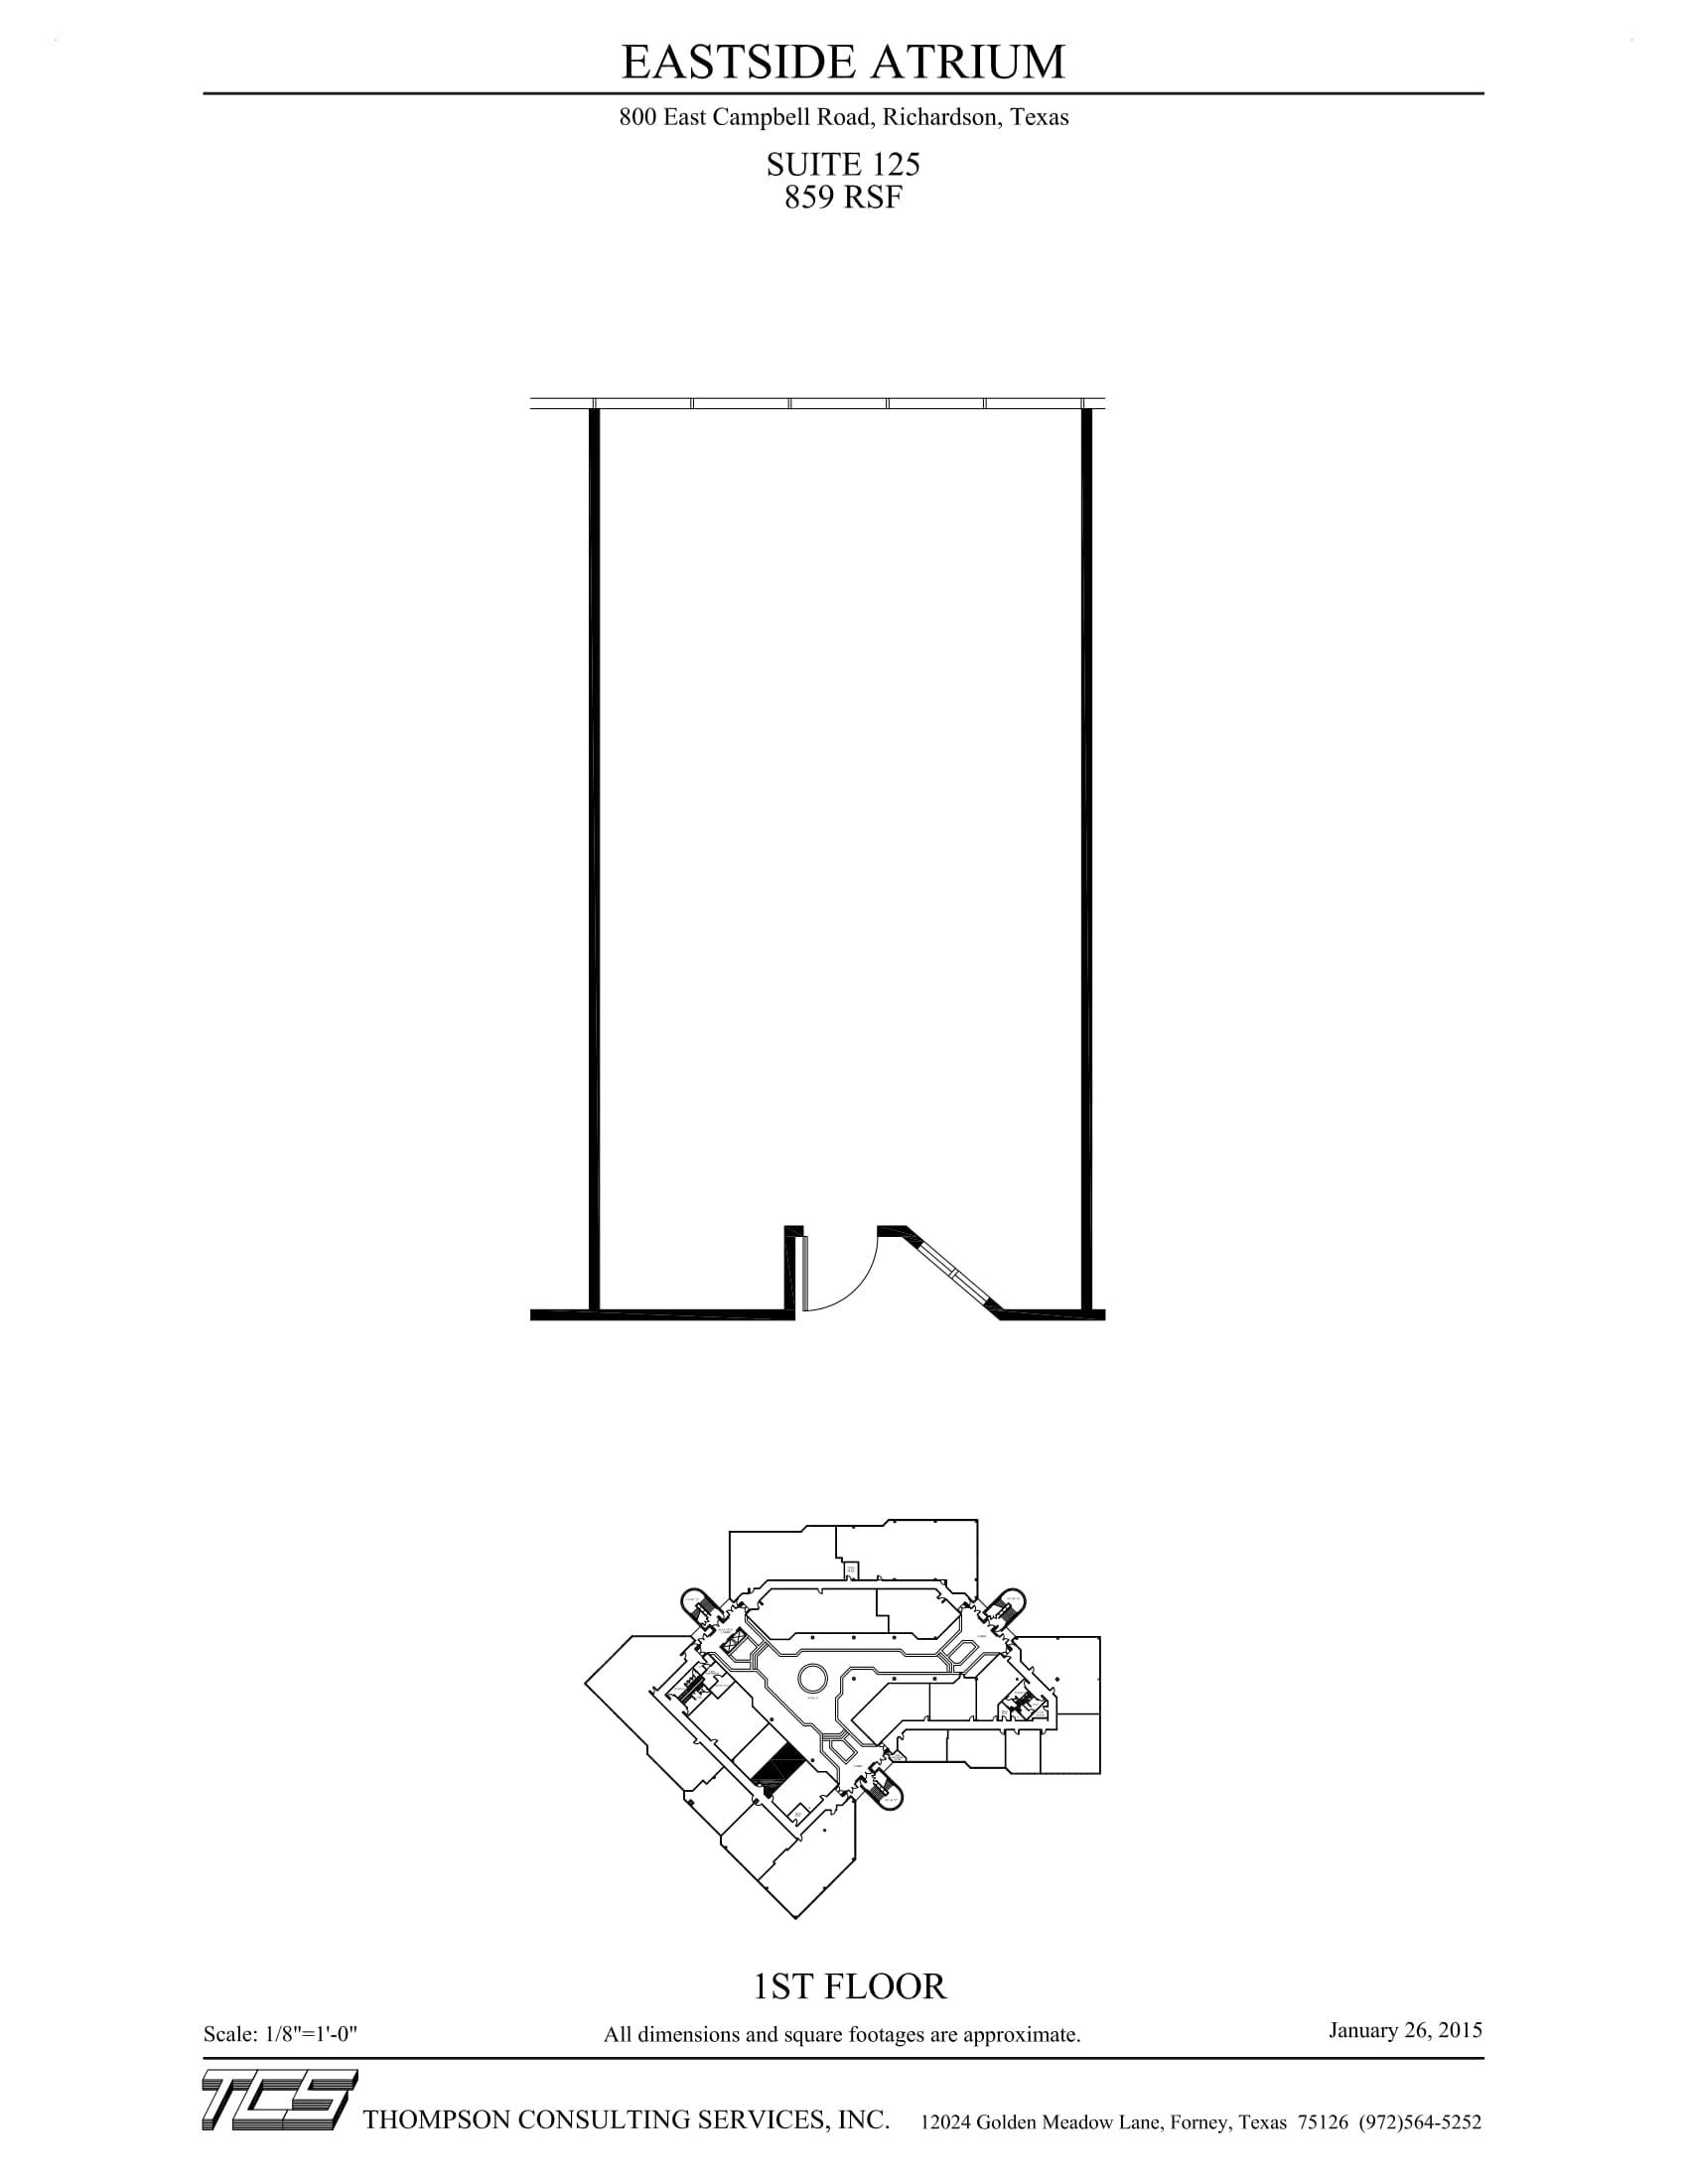 Eastside Atrium - Suite 125 - Marketing Plan-1